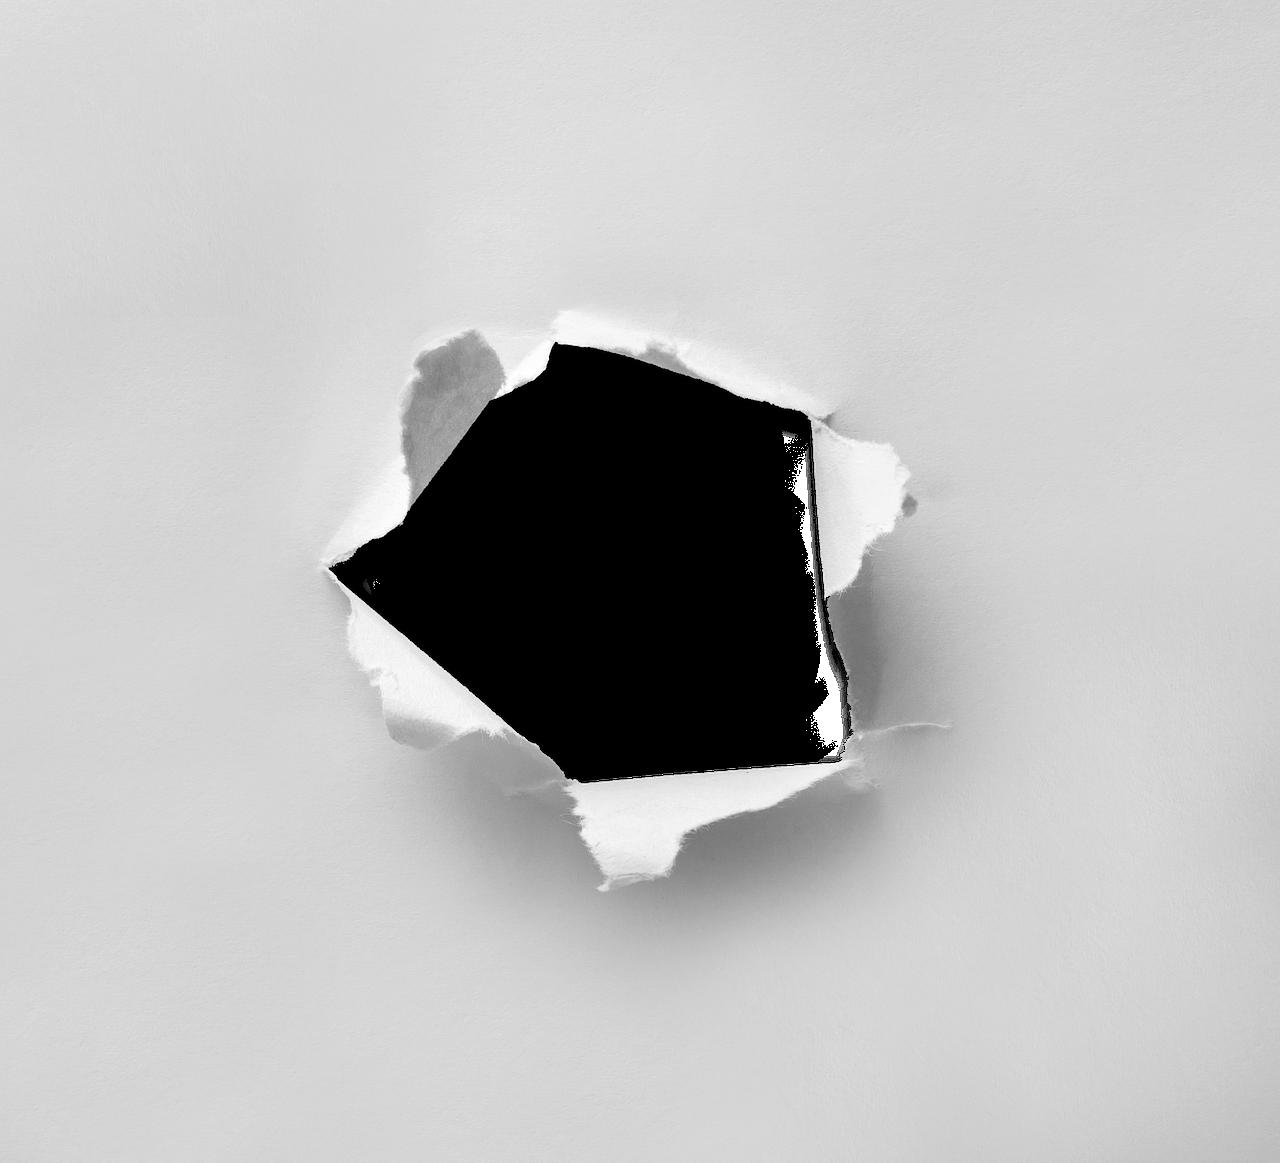 Hole, Torn, Paper, Through, Round